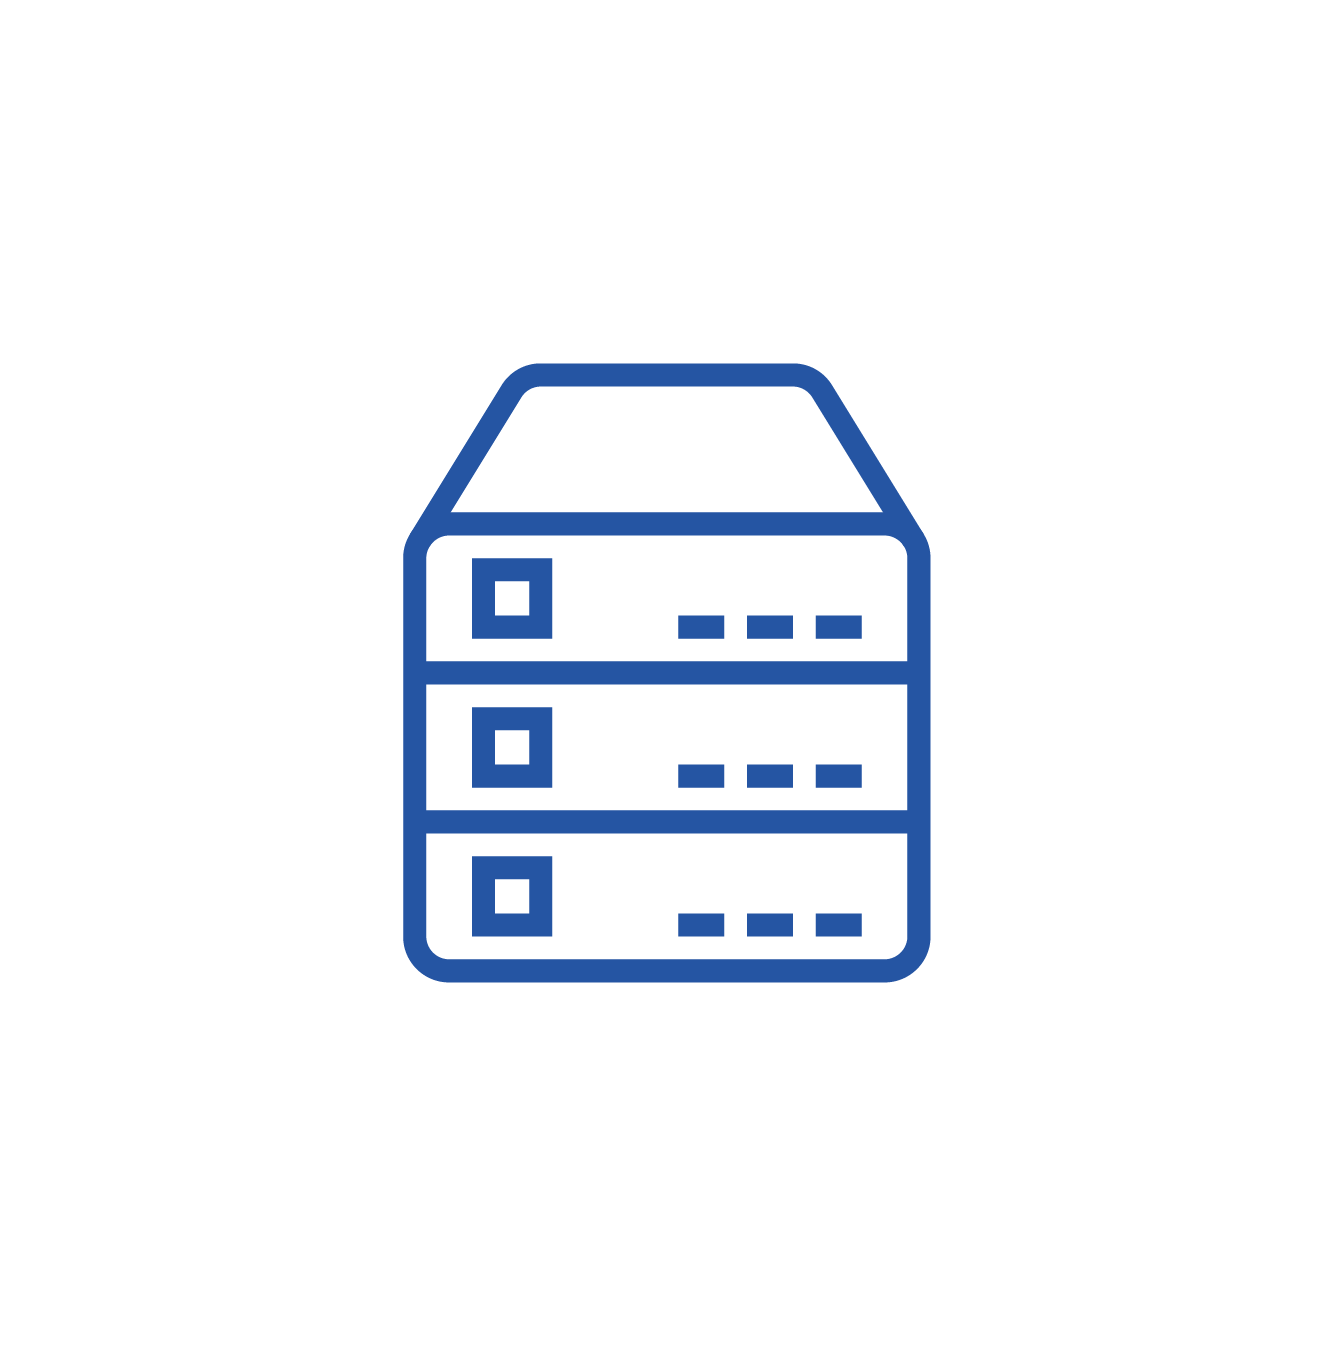 Server icon to represent the Prometheus Master Data As-a-Service module.